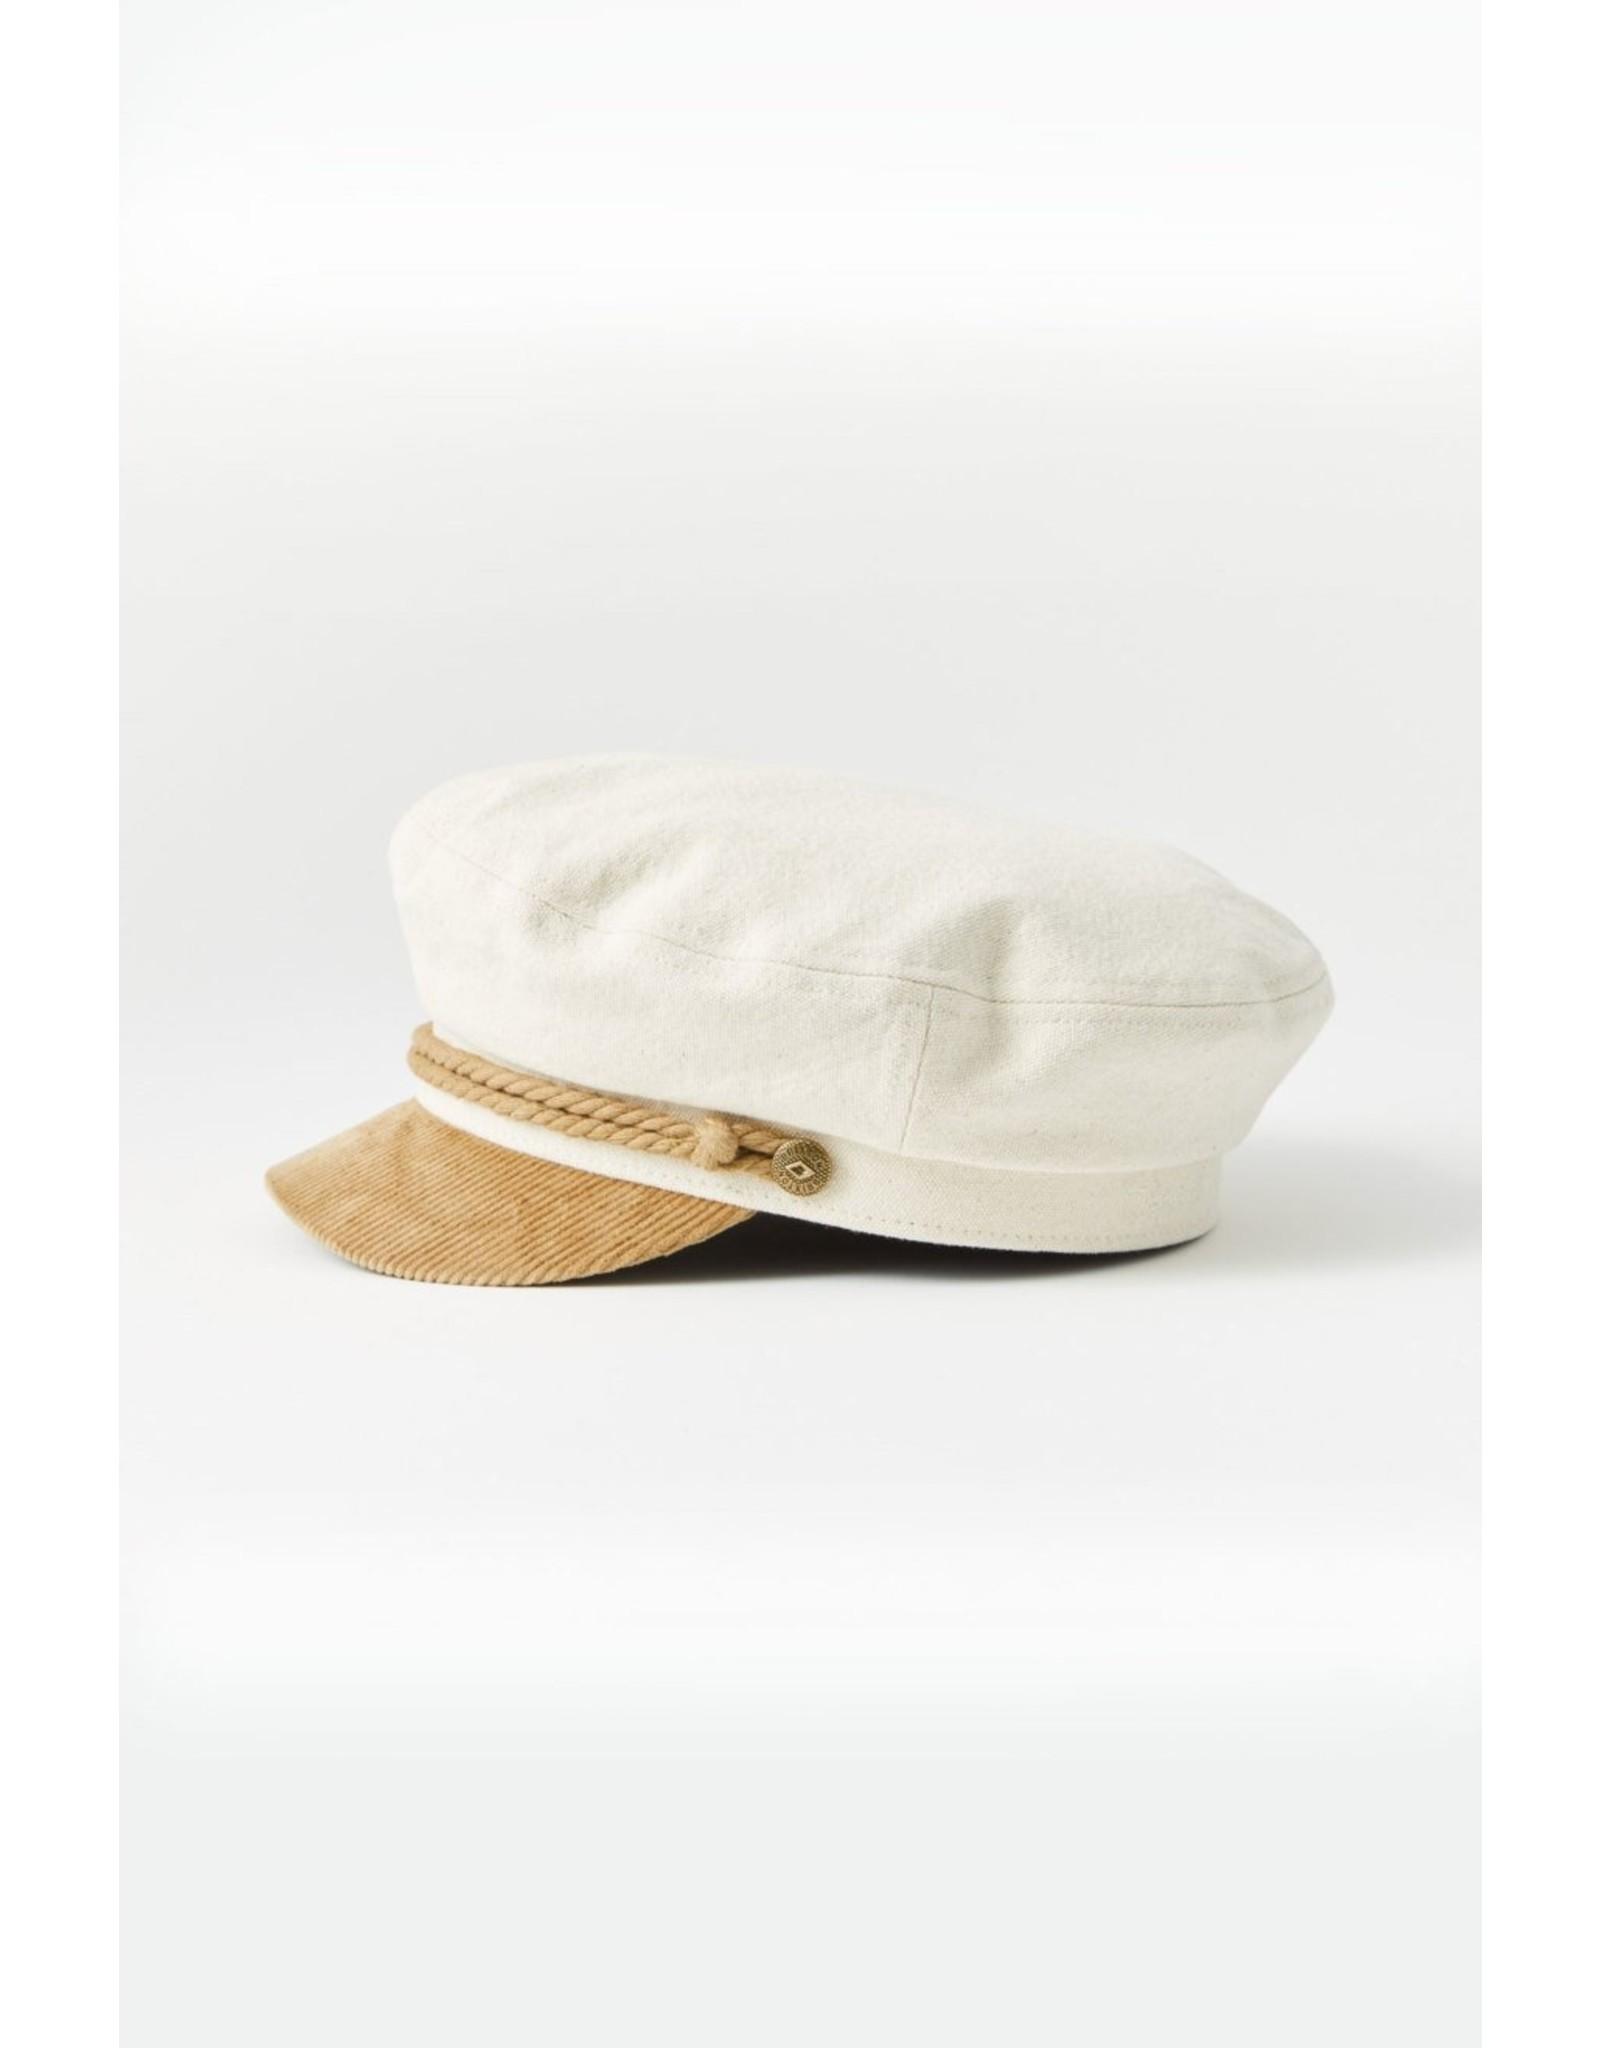 BRIXTON BRIXTON - FIDDLER CAP - BEIGE/TAN -